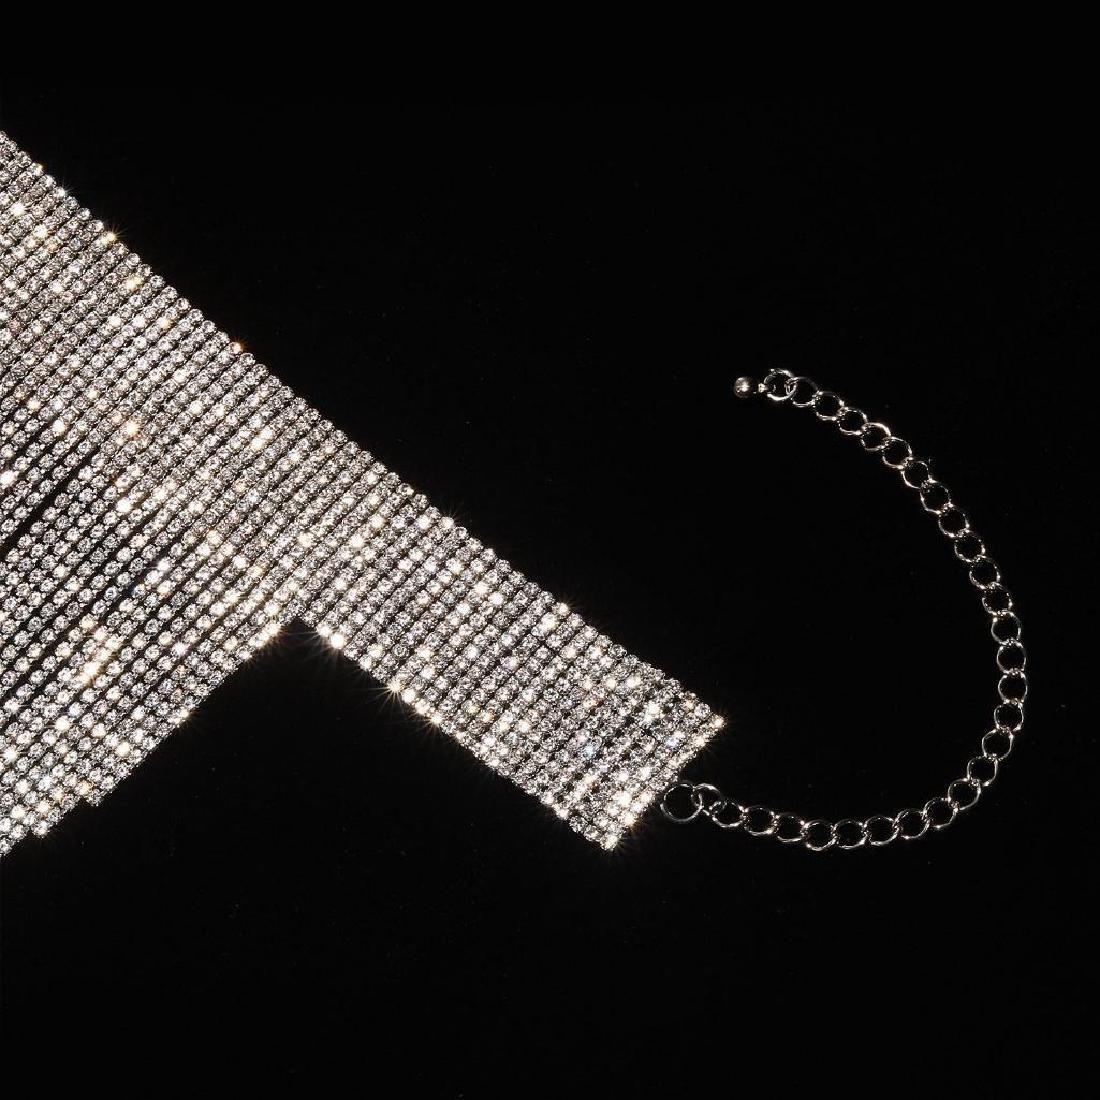 Holylove Charm Rhinestone Tassels Choker Collar Pendant - 5